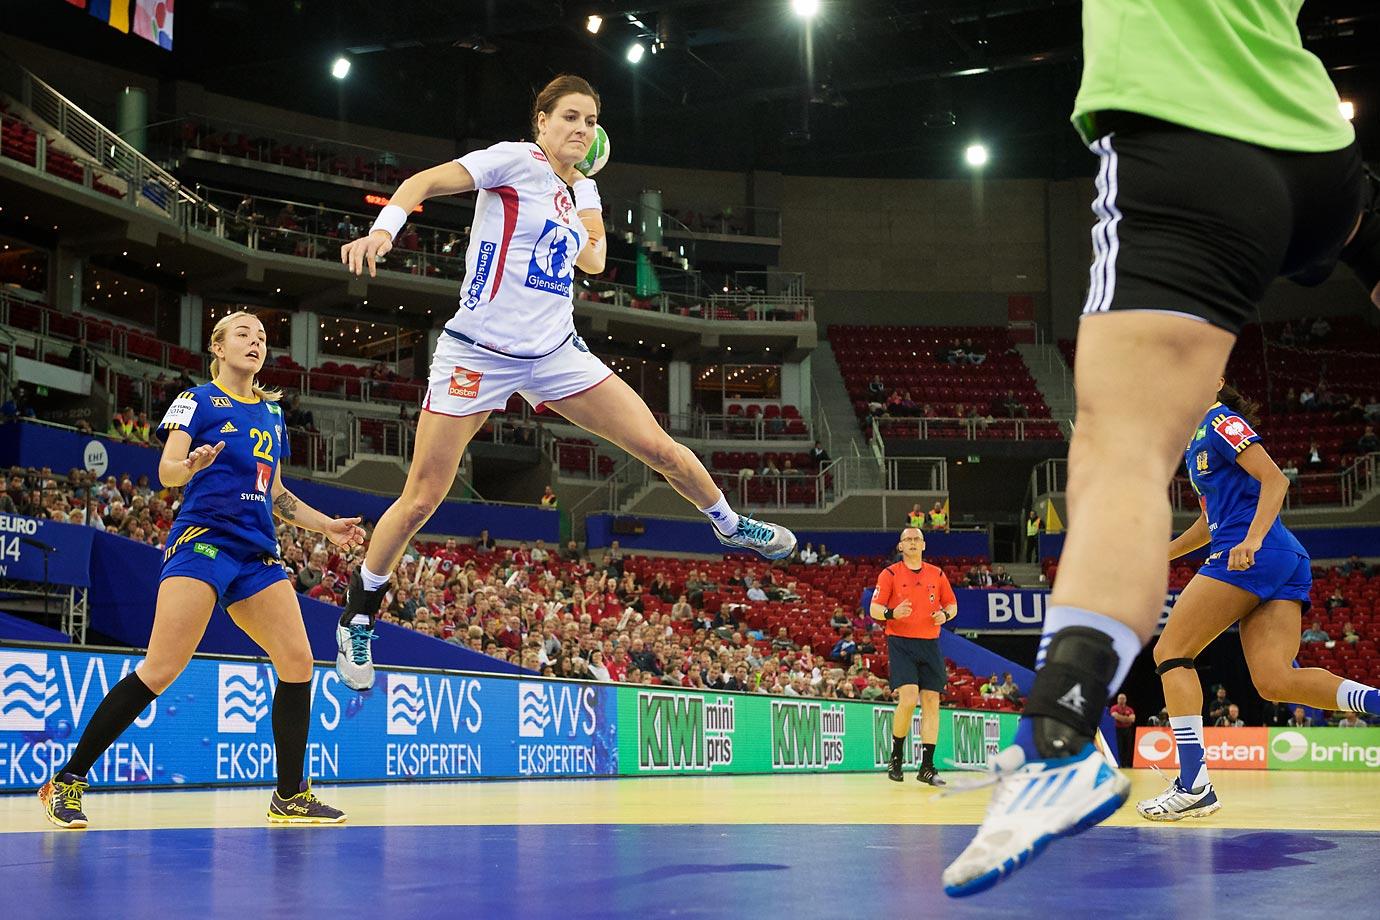 Norway's Linn-Kristin Riegelhuth Koren scores during a semi-final game against Sweden.